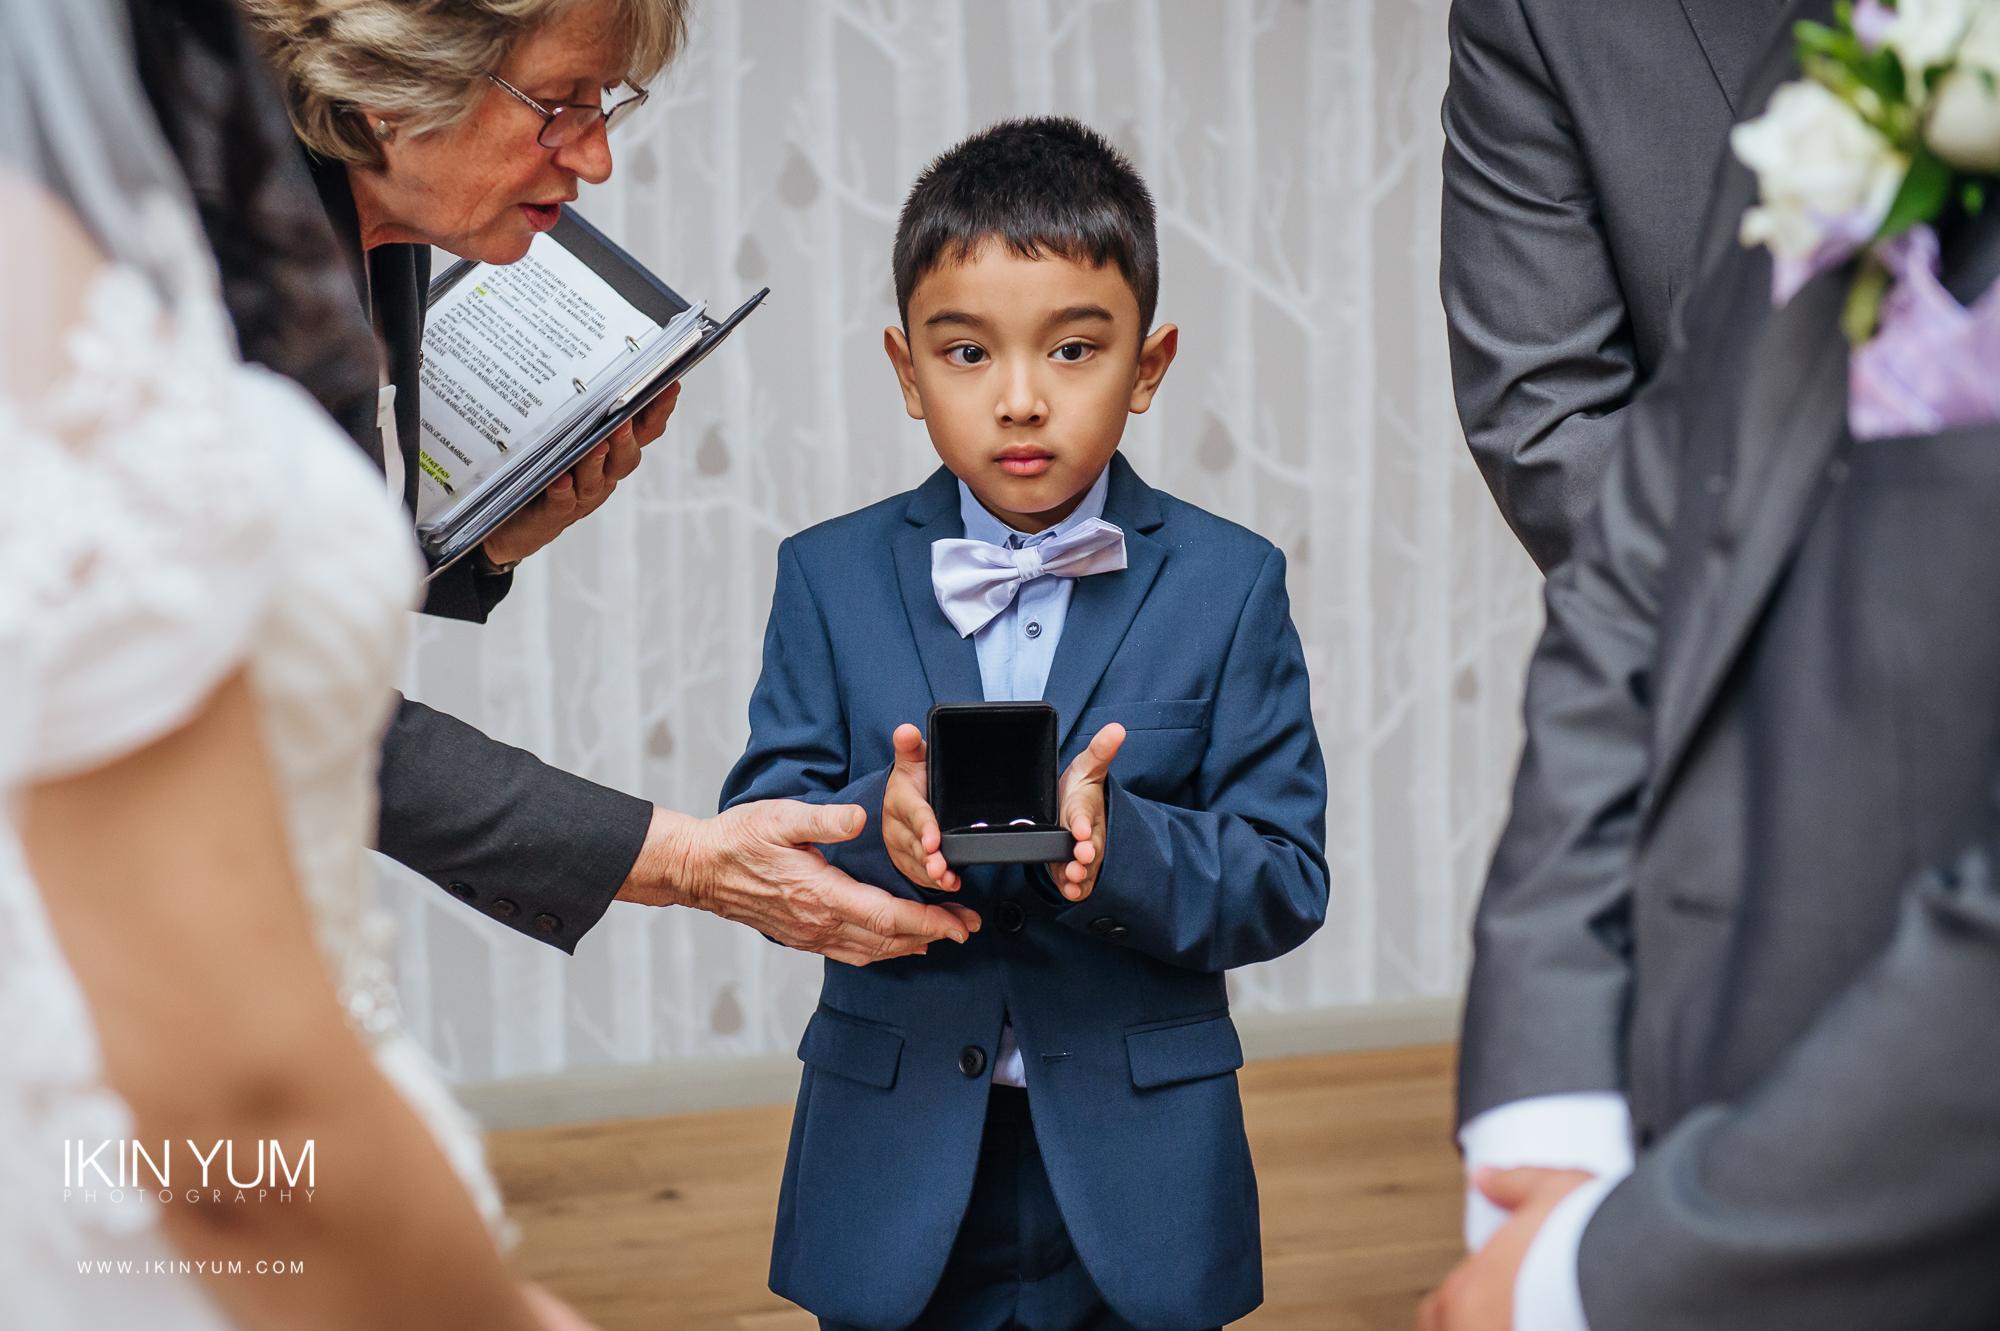 Hampton Manor Wedding - Ikin Yum Photography -079.jpg